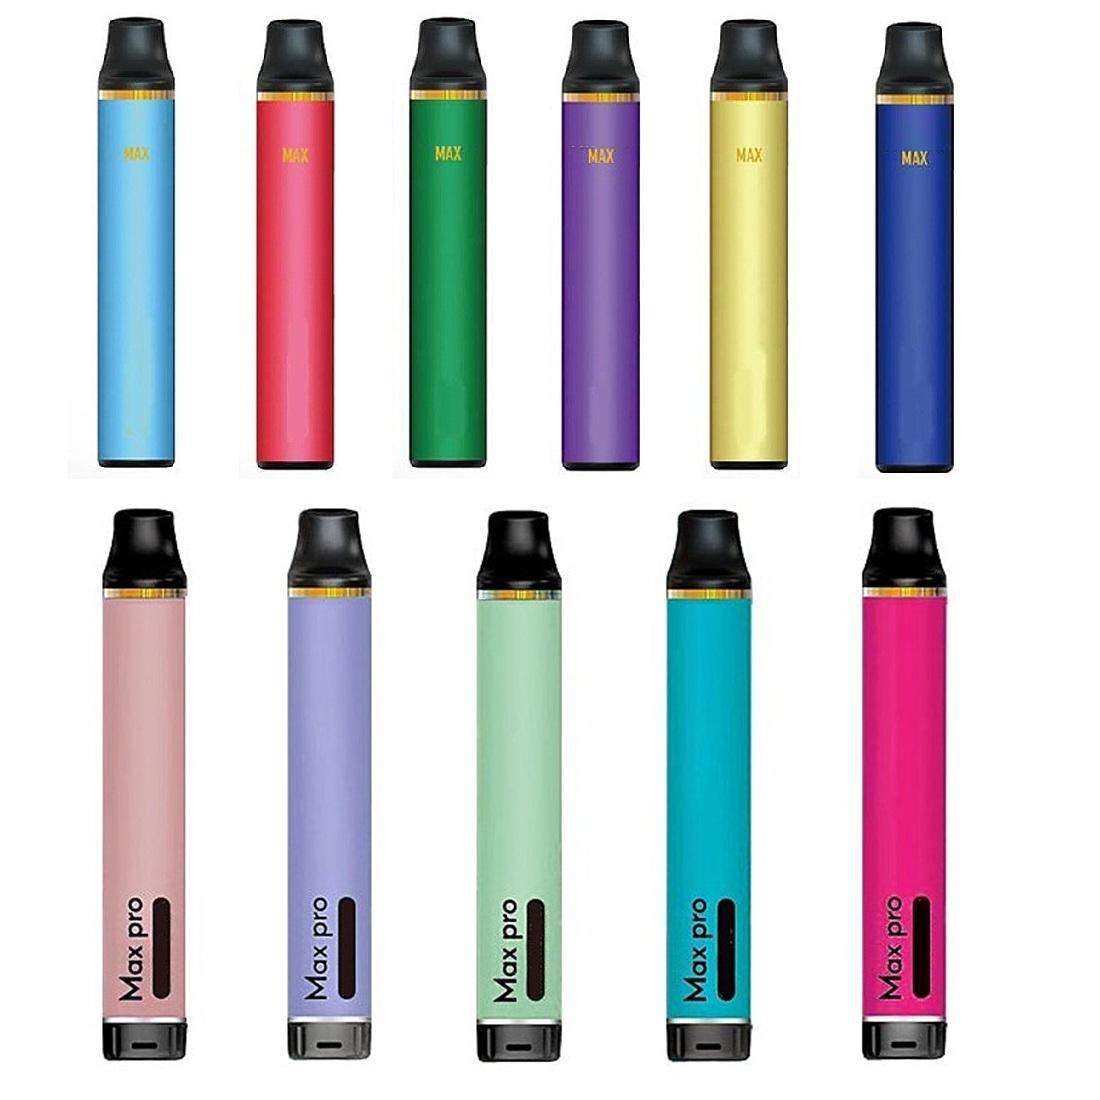 Max Pro Disposable Pod Device 3.5ml 5ml Prefilled Vape Stick Pen Aio System Starter Kit Bar for Mr Vapor